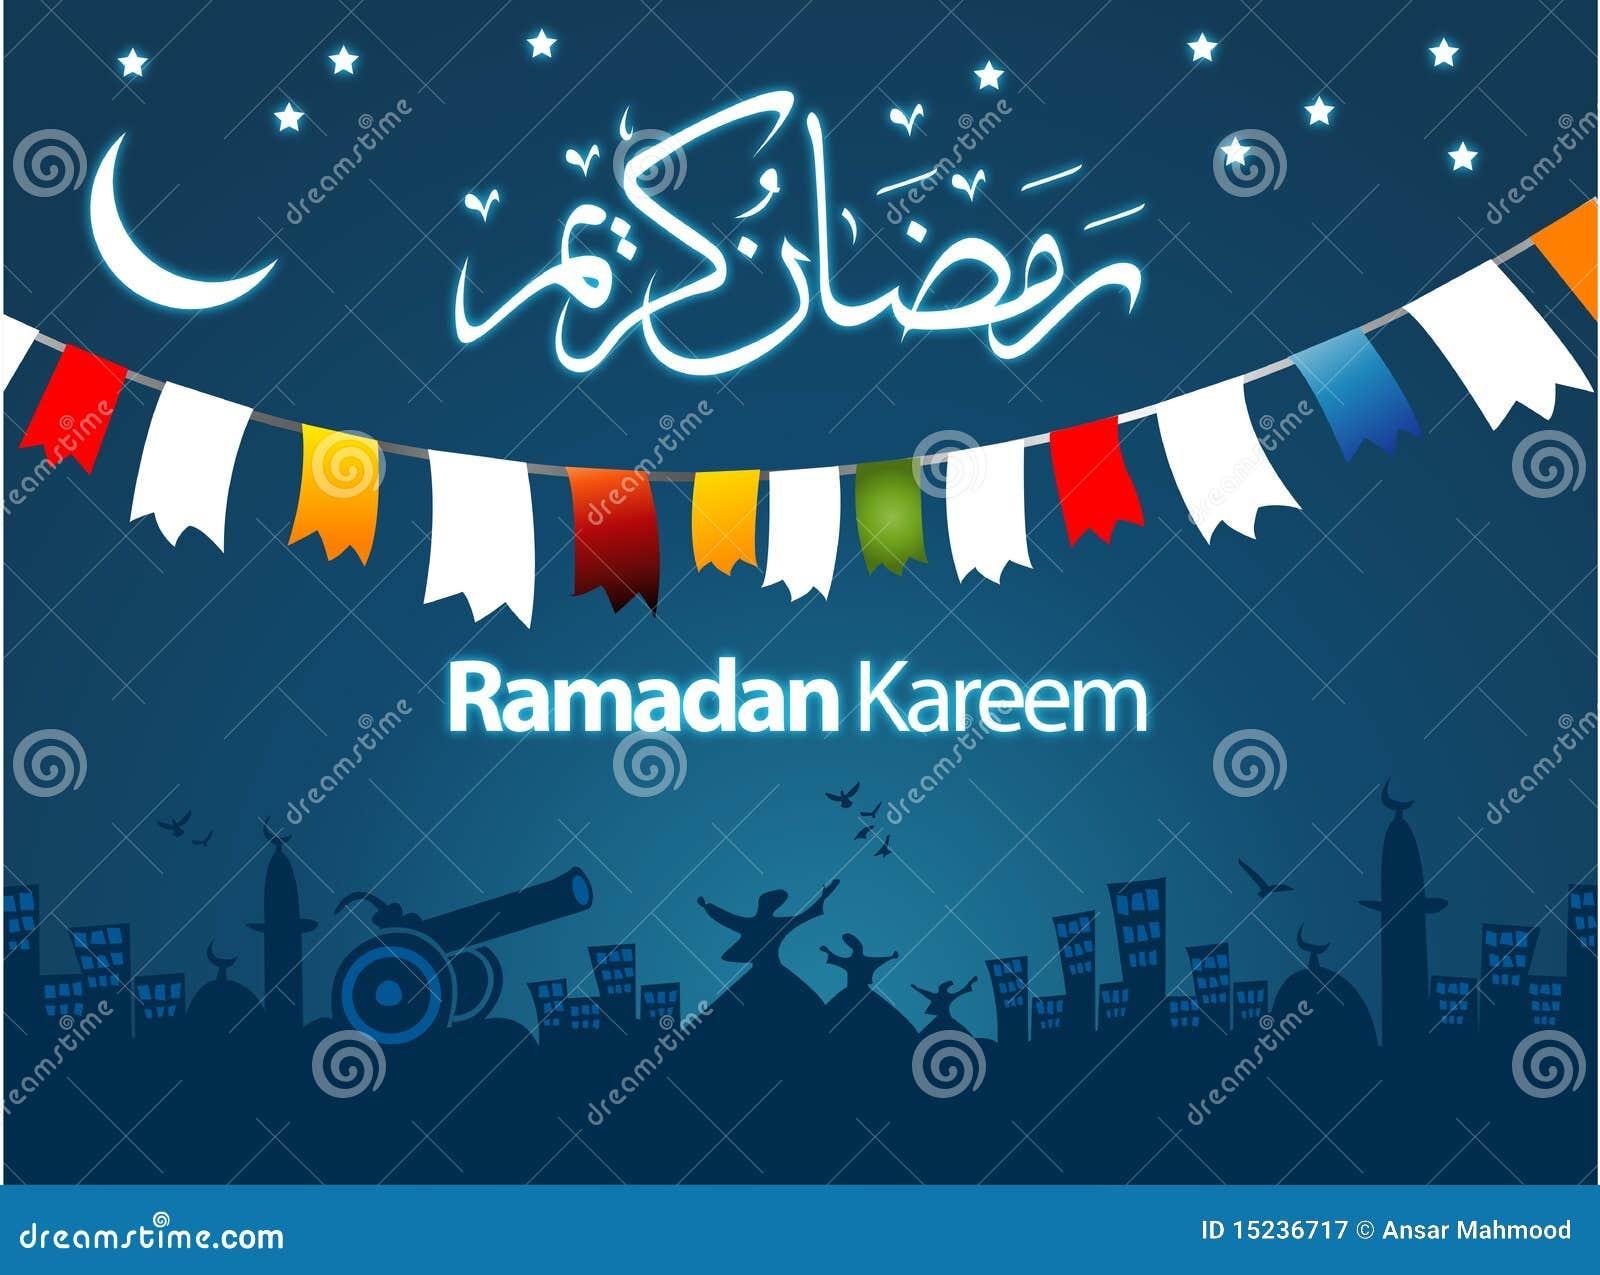 Ramadan greeting card illustration stock illustration illustration royalty free stock photo kristyandbryce Images